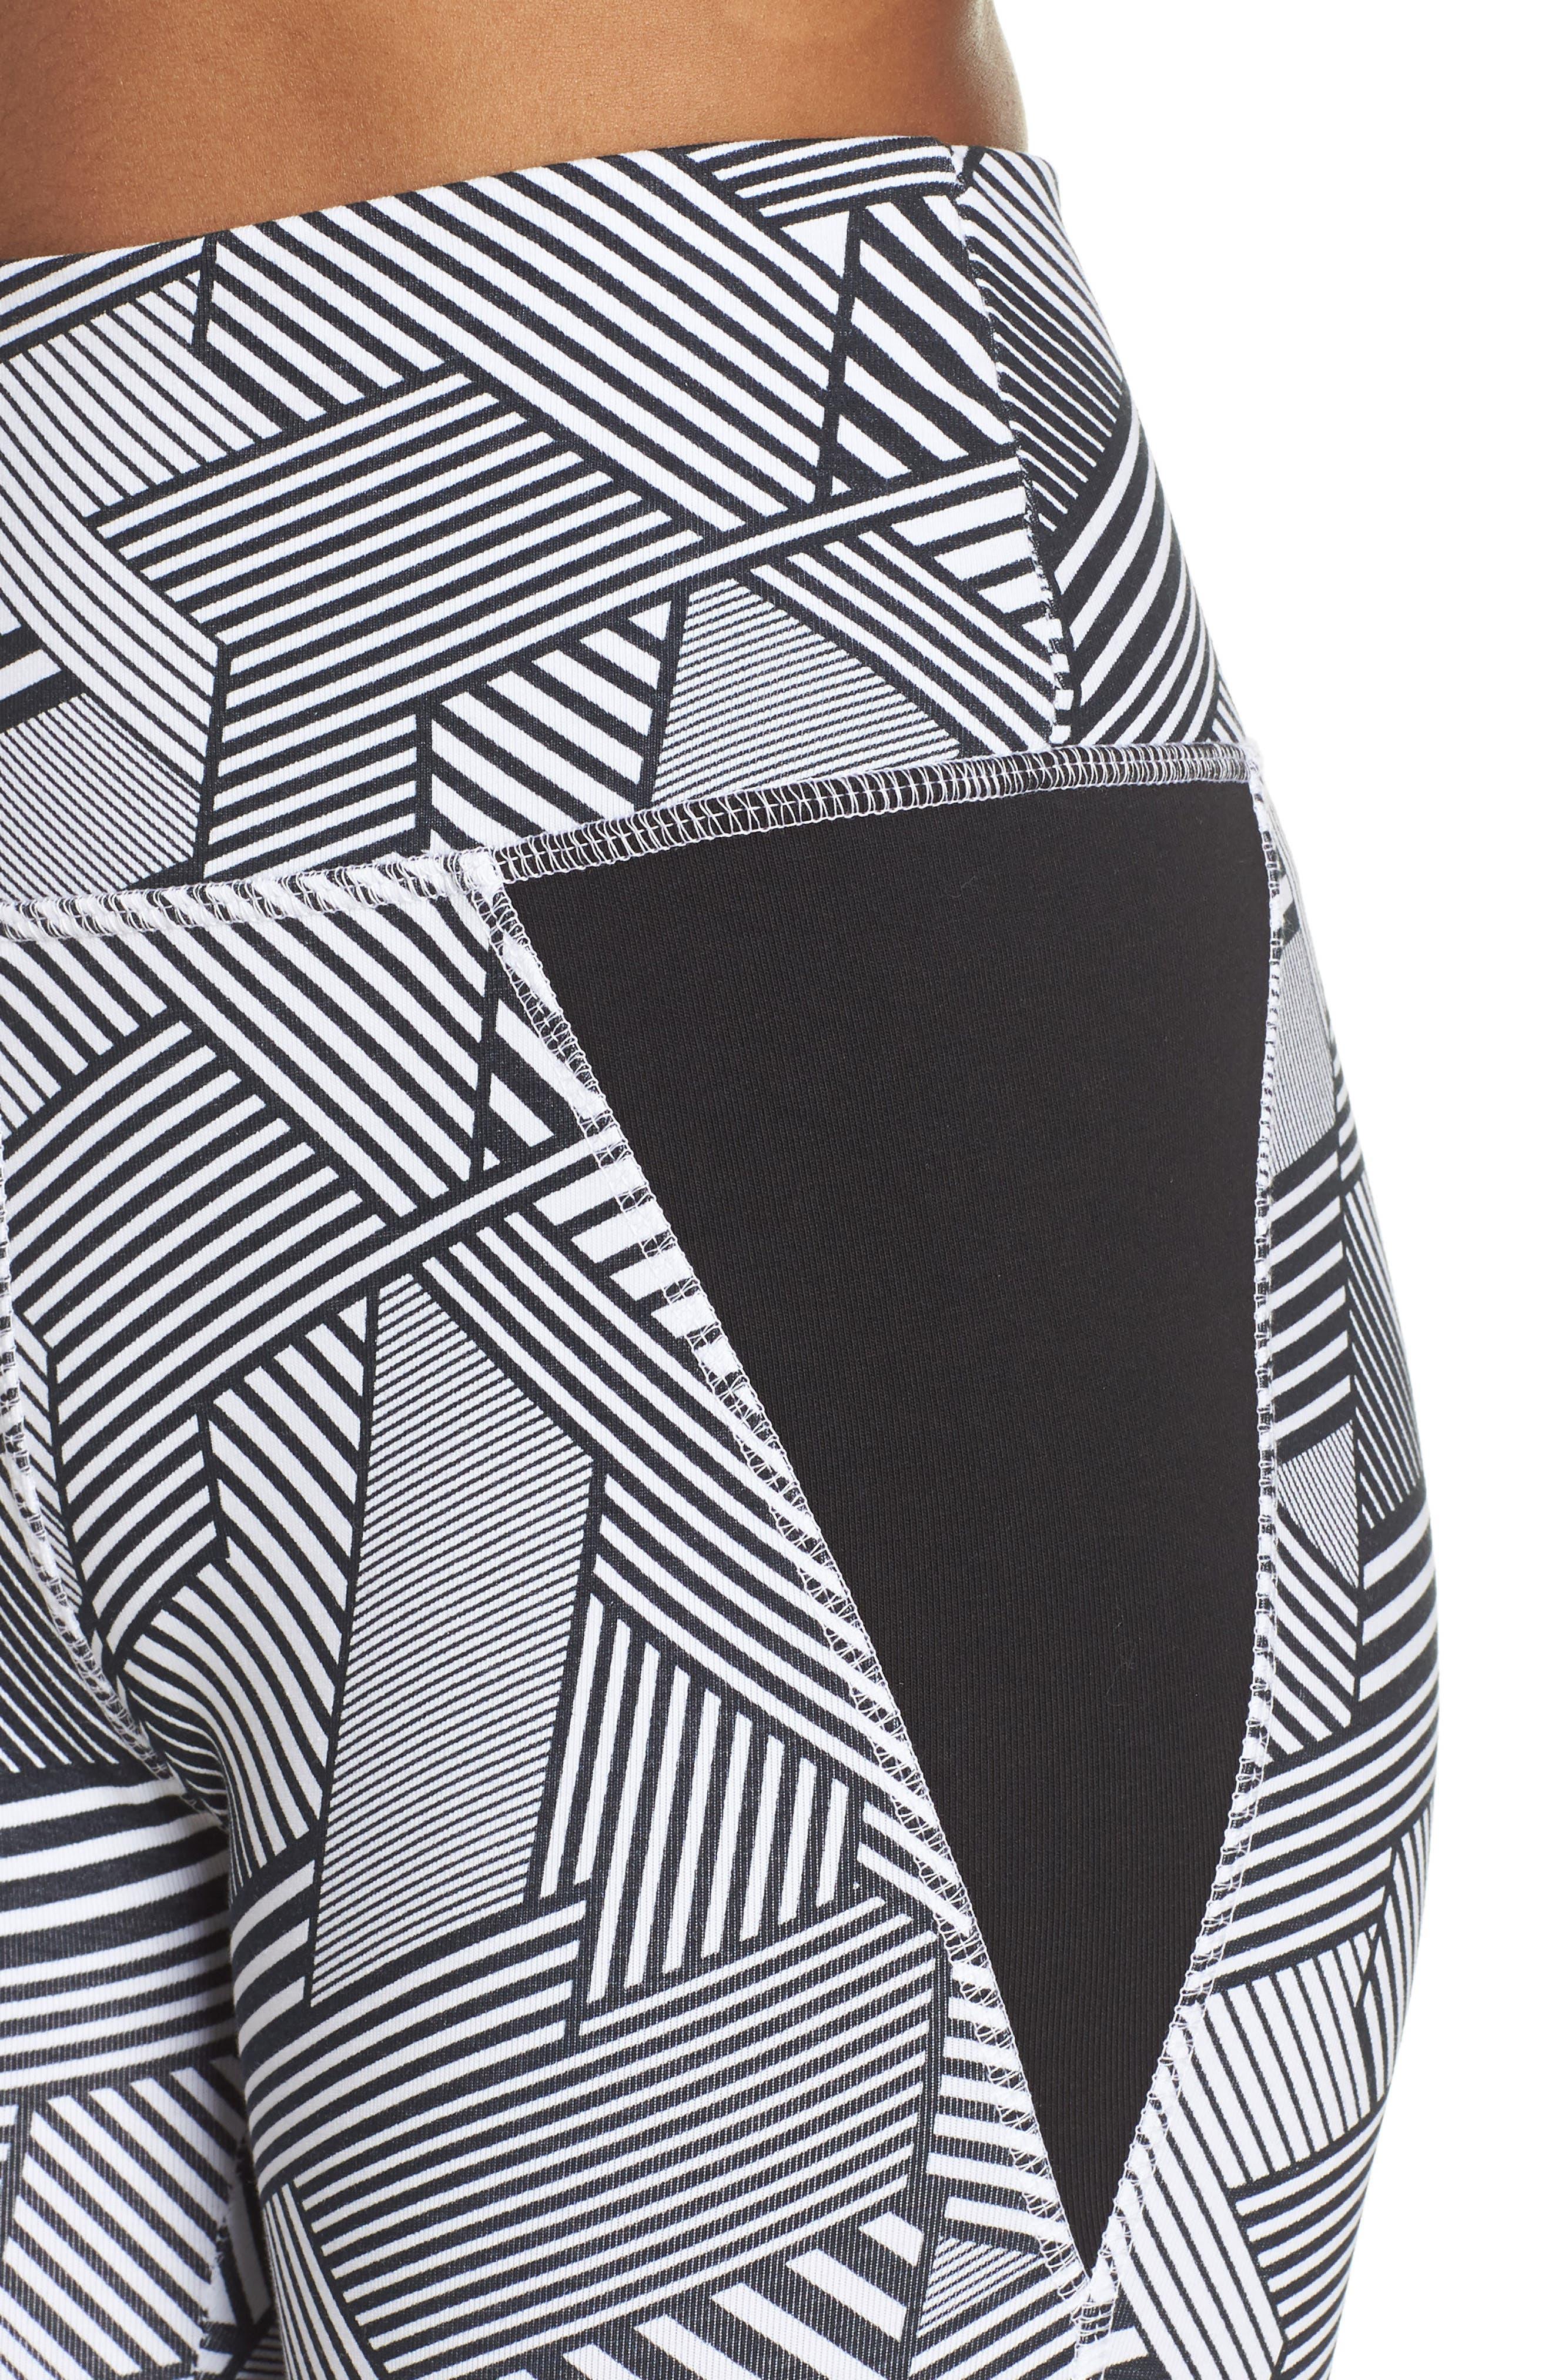 247 Sport Leggings,                             Alternate thumbnail 4, color,                             Black Multi